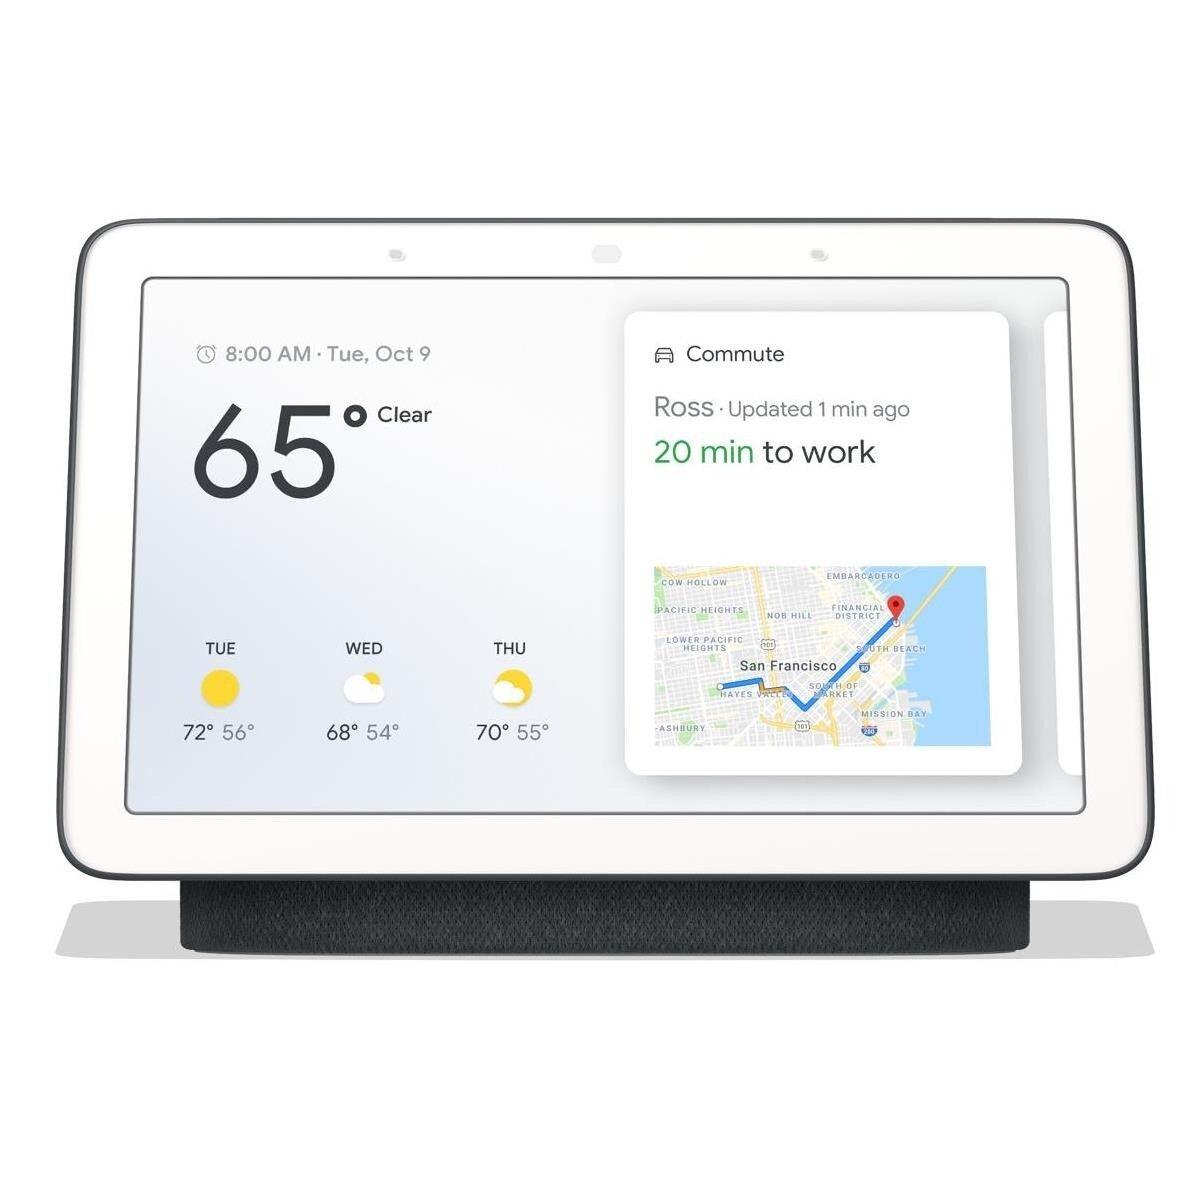 Google Home Hub Assistant (GA00515-US) Charcoal Grey Smart 7  Display BRAND NEW